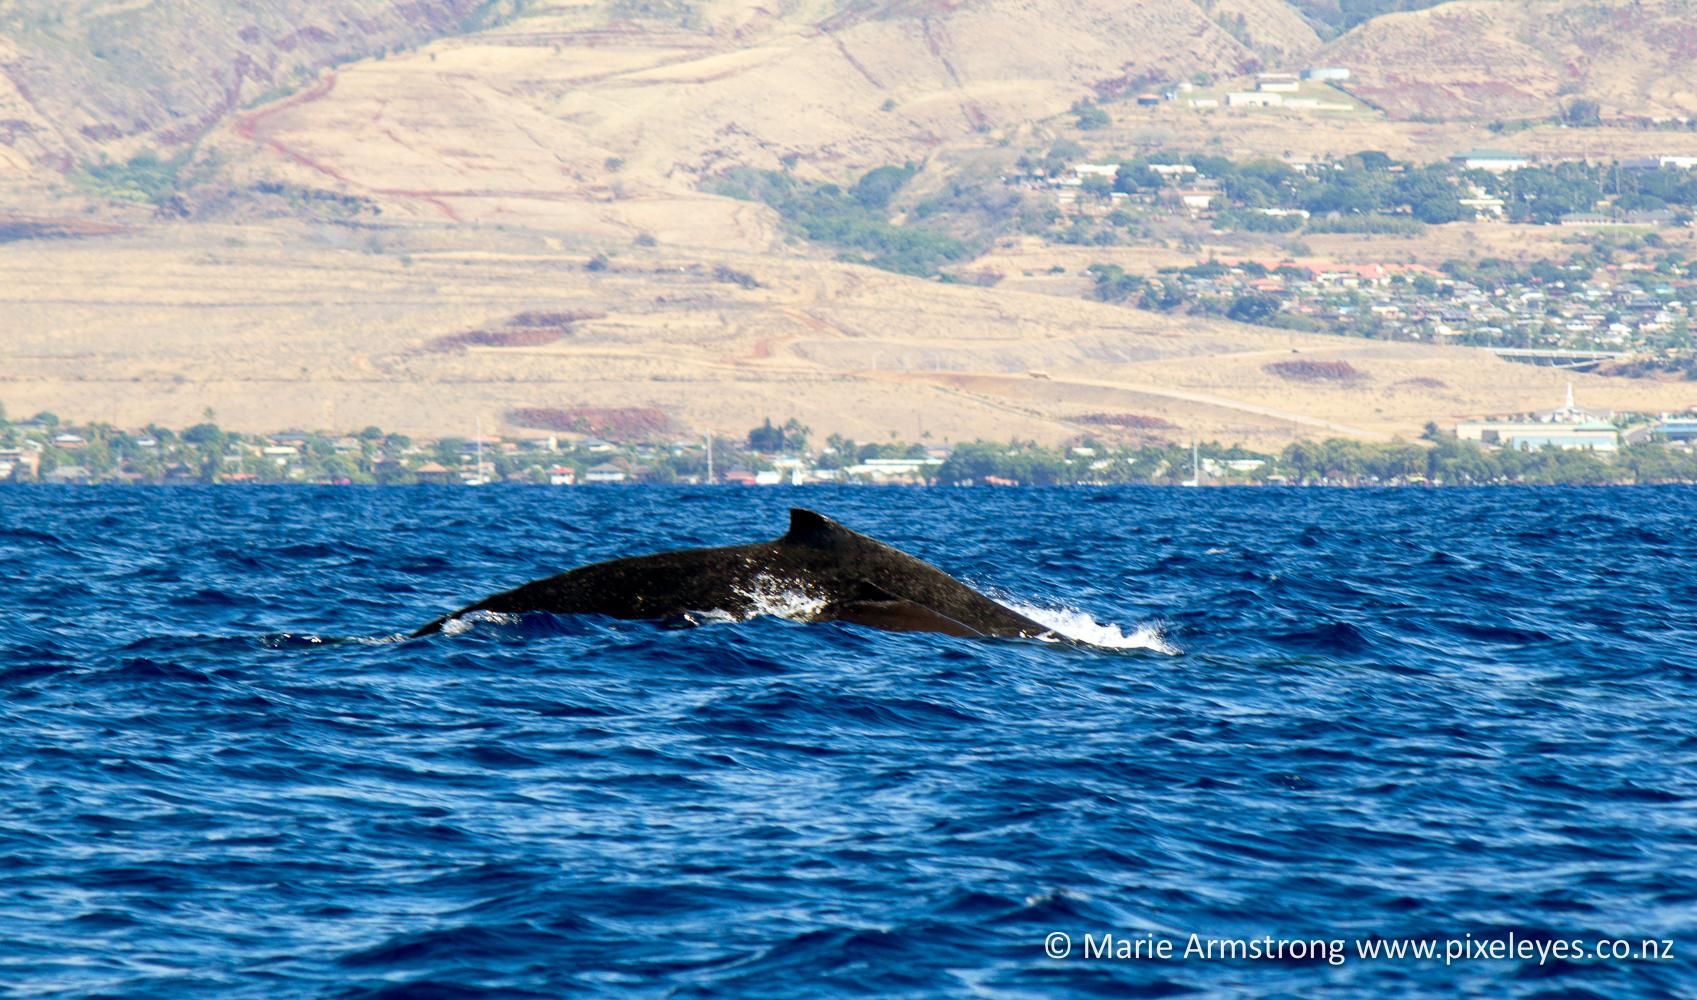 Humpback whales – Hawaii Part 8